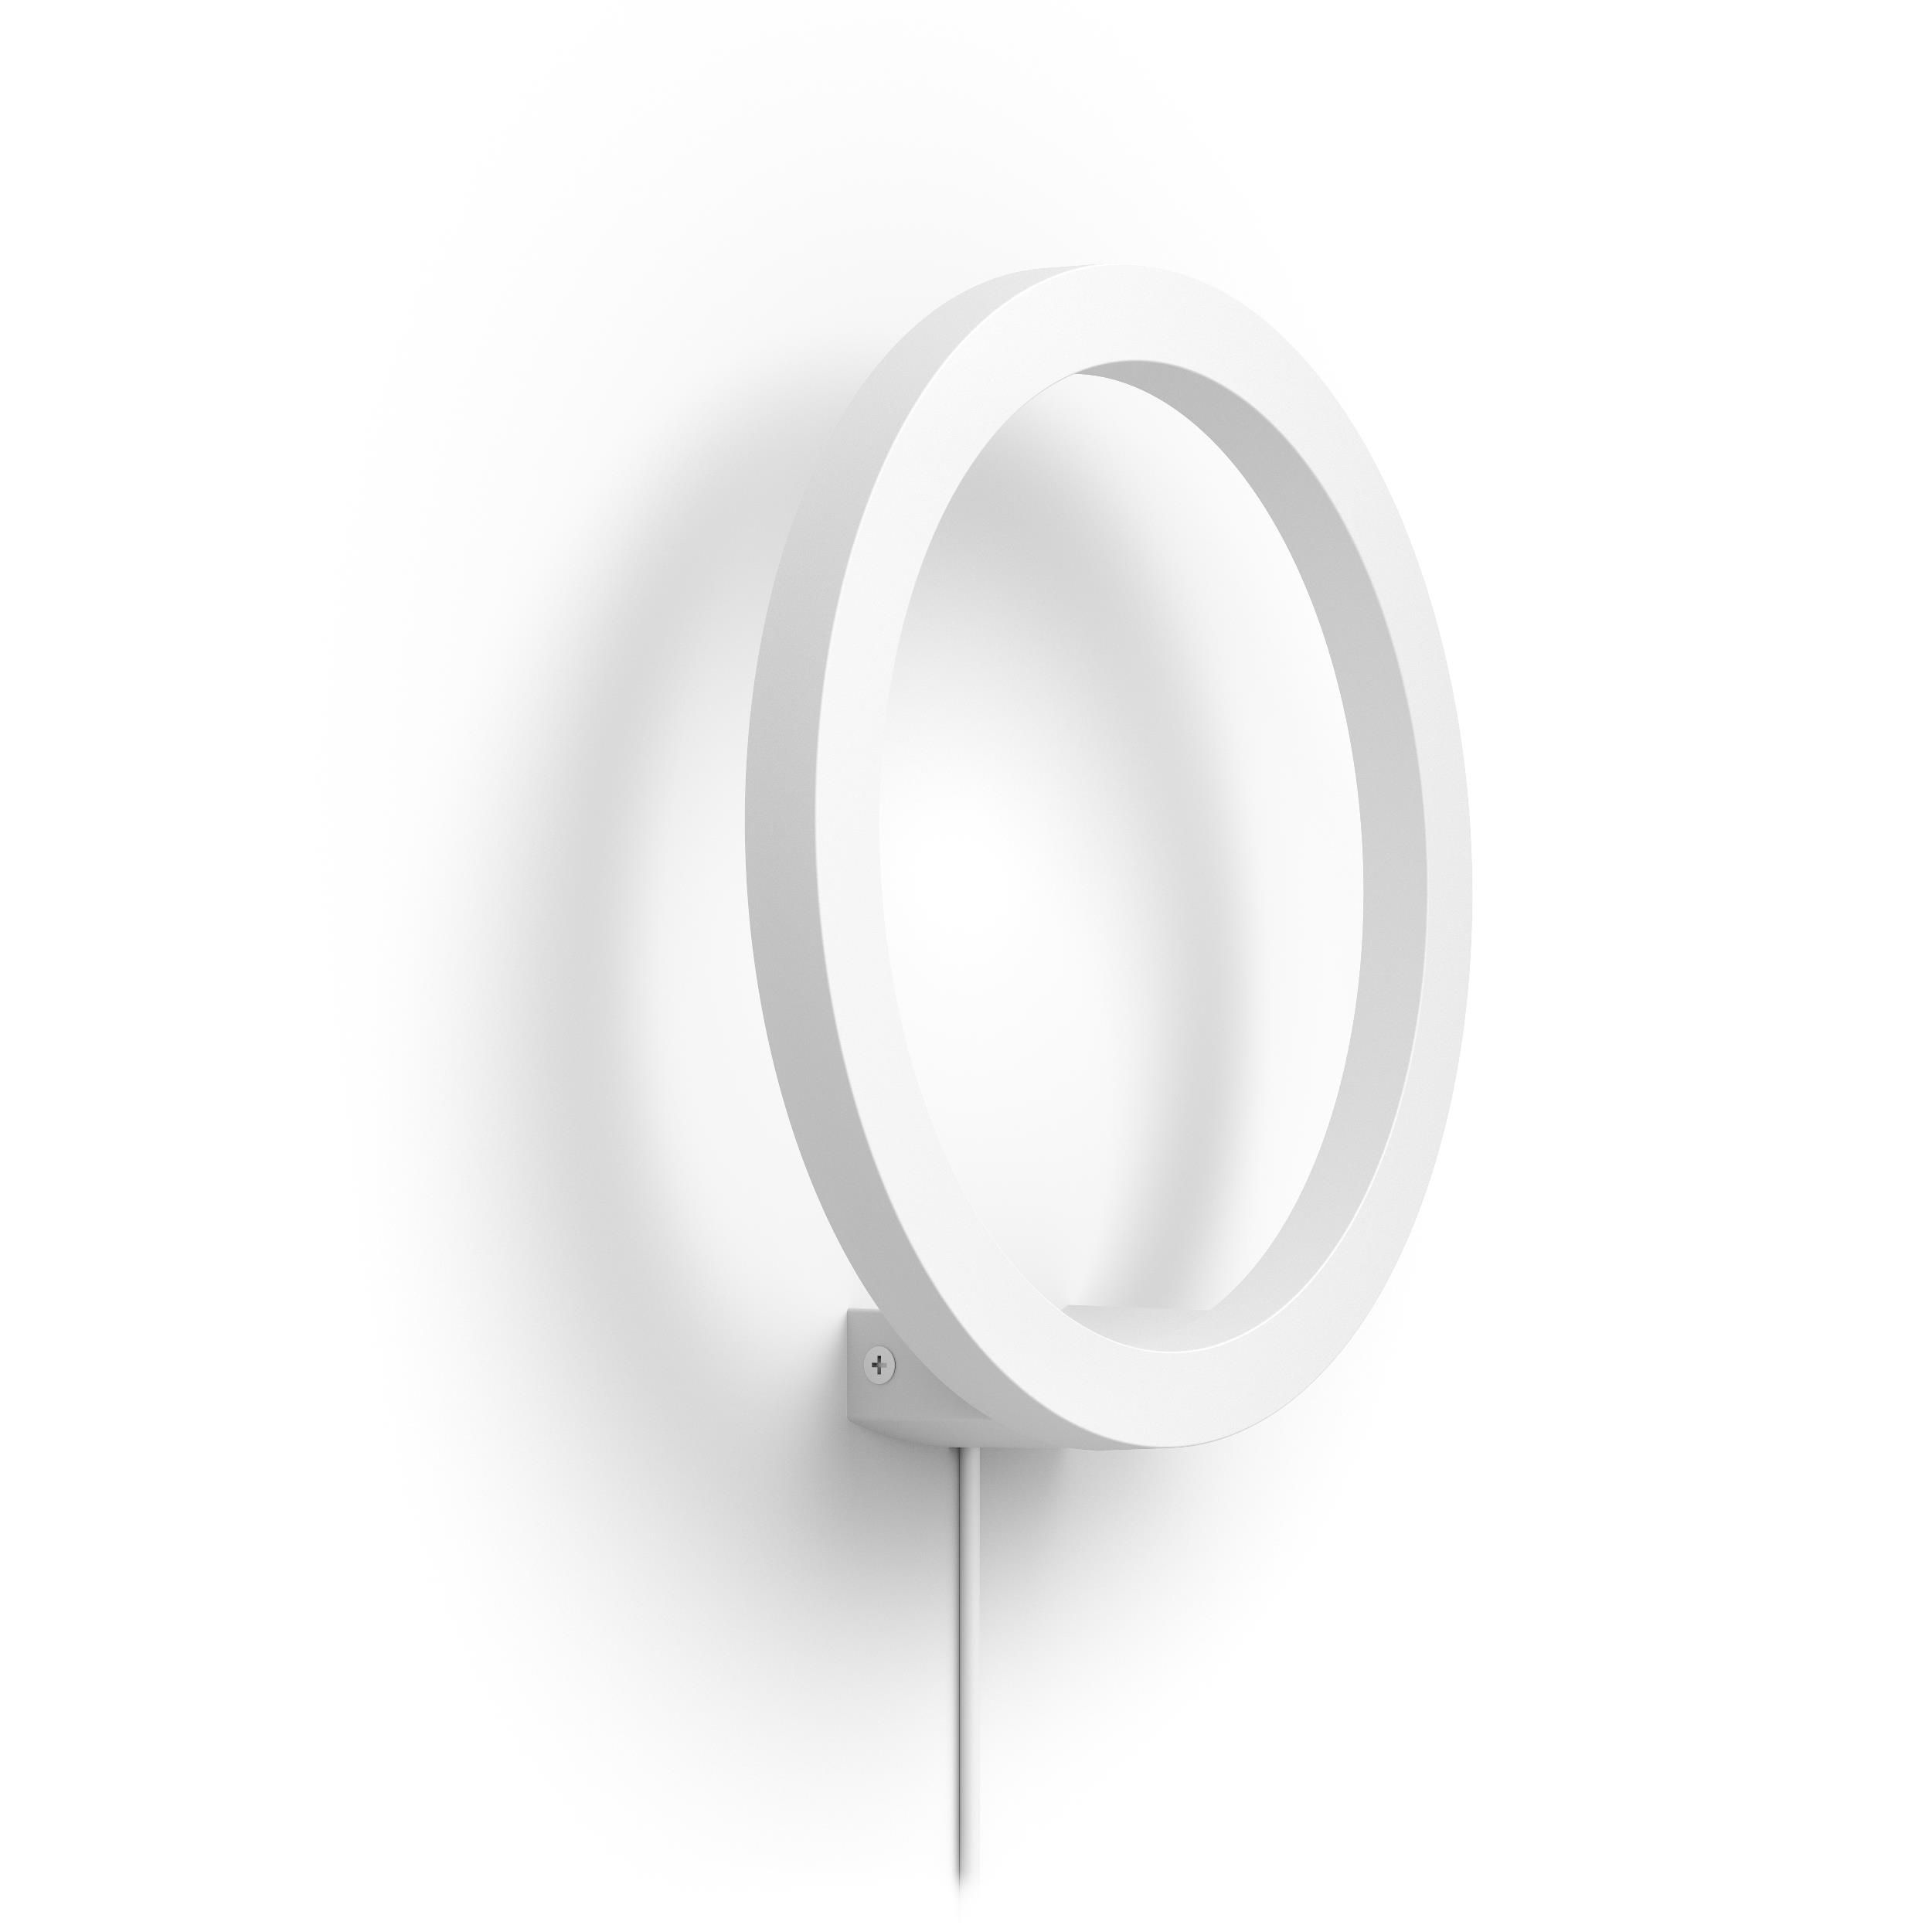 Philips Hue - Sana Wall Light White - White & Color Ambiance